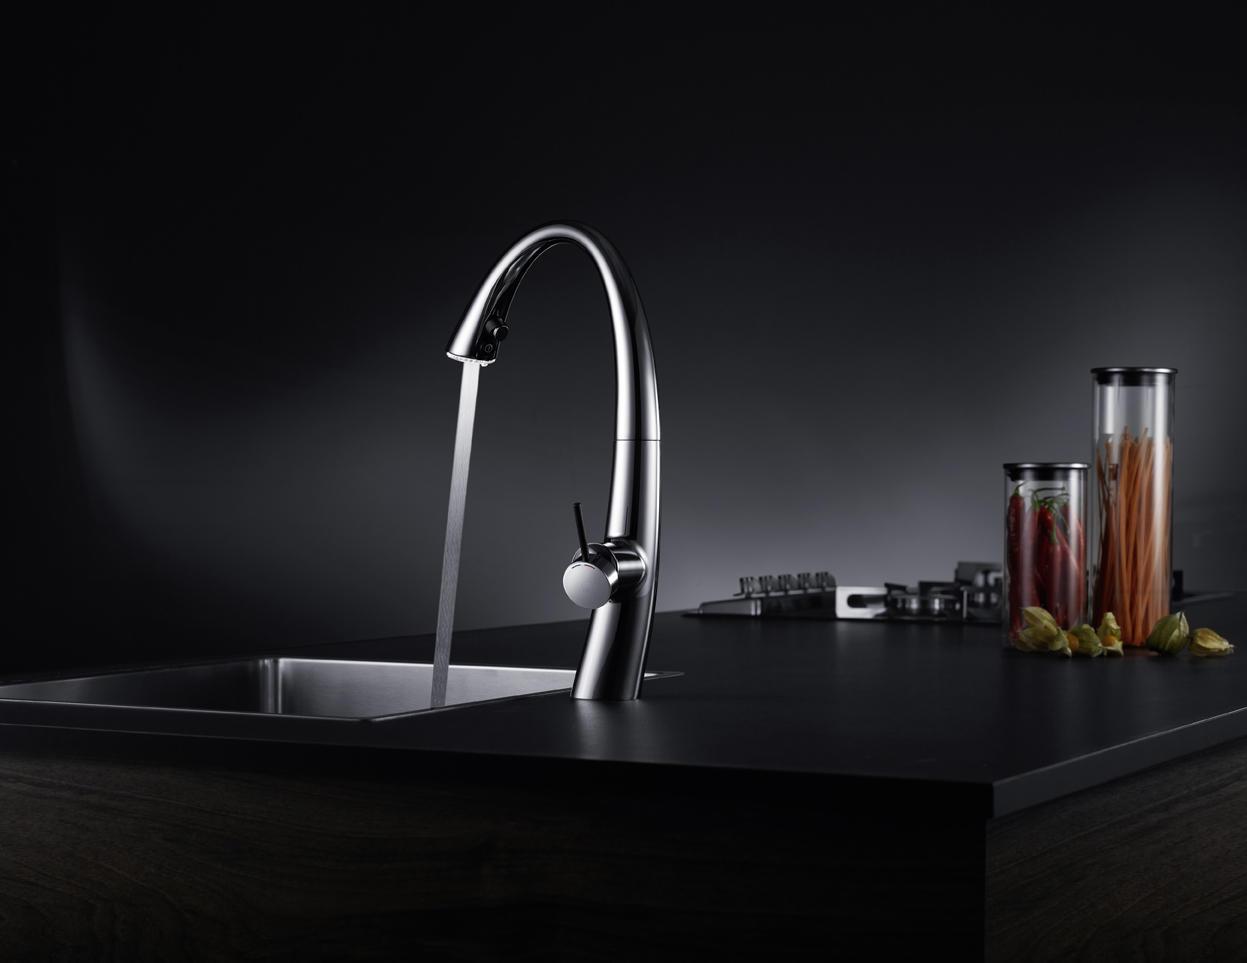 KWC ZOE LEVER MIXER| SWIVEL SPOUT 90° - Wash-basin taps from KWC ...